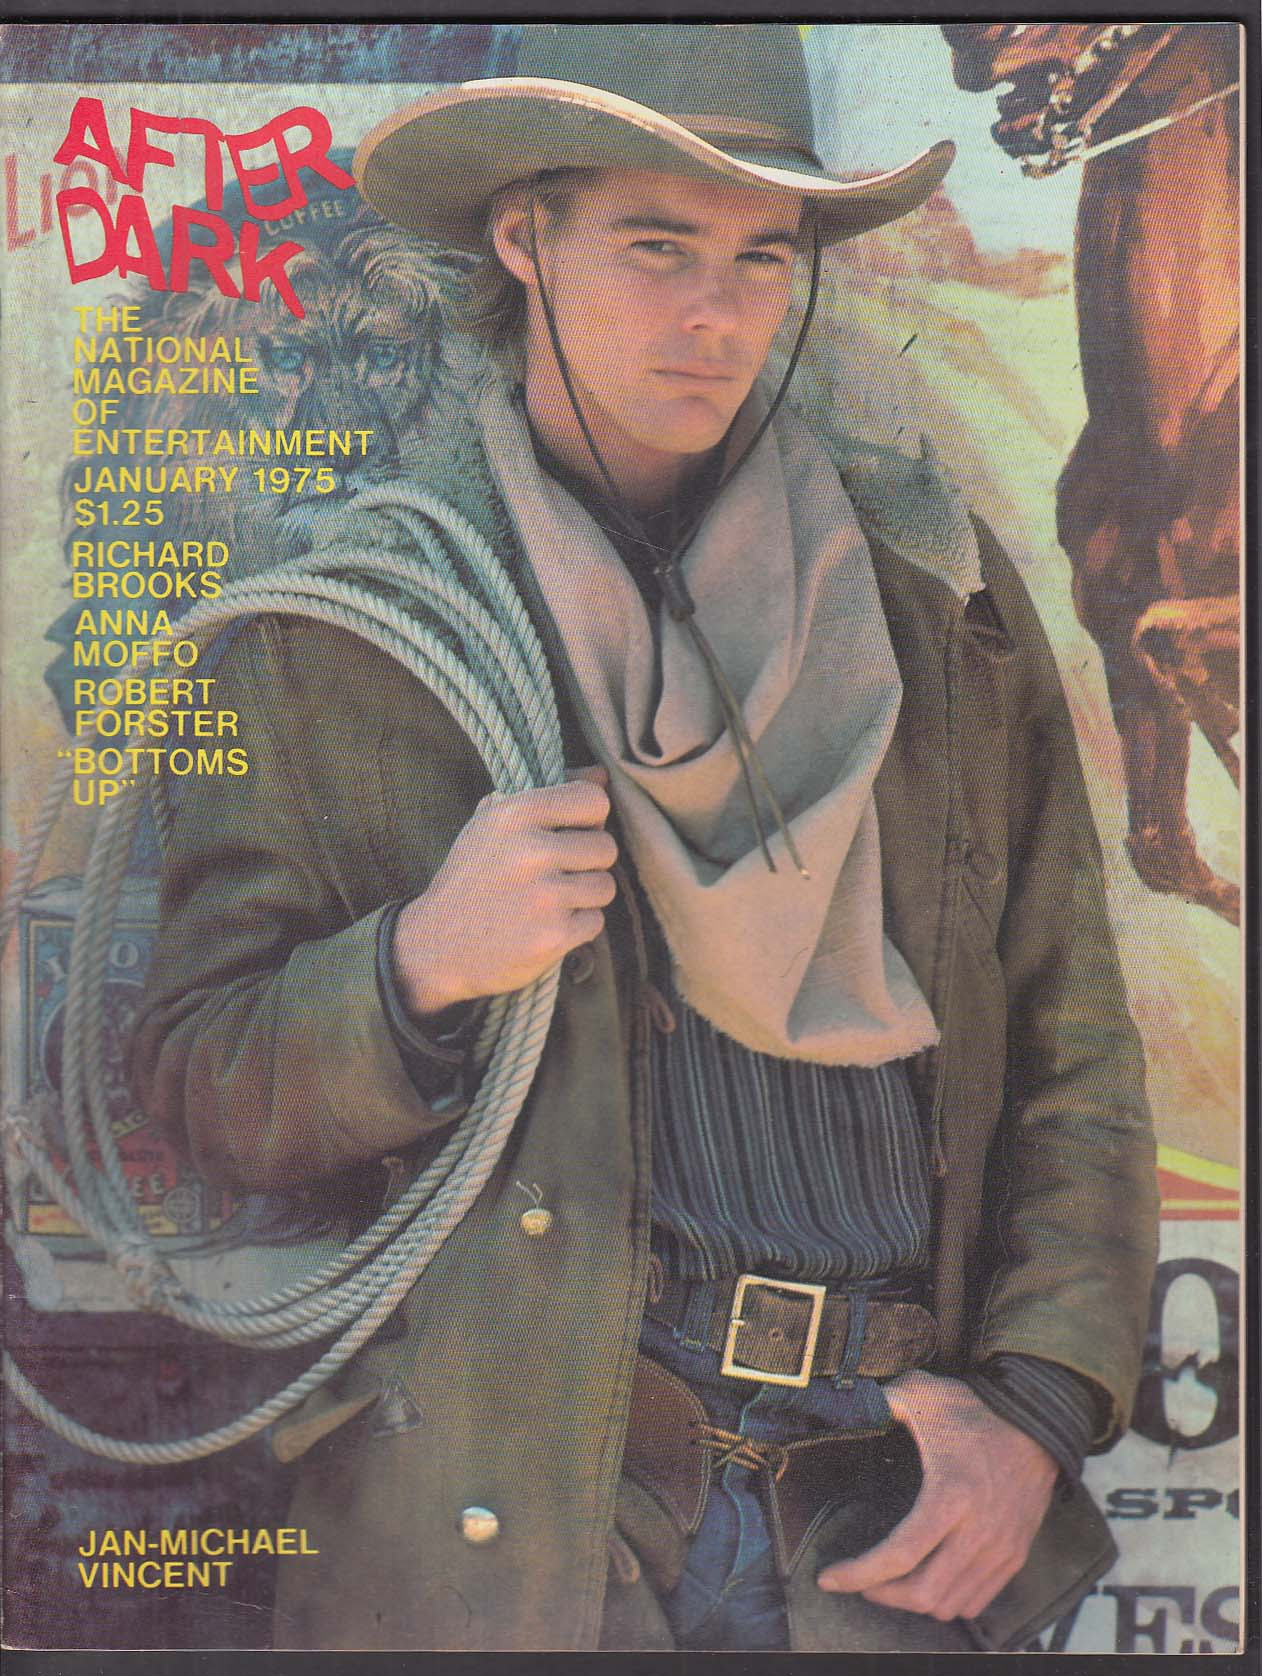 AFTER DARK Jan-Michael Vincent Richard Brooks Ana Moffo Robert Forster 1 1975